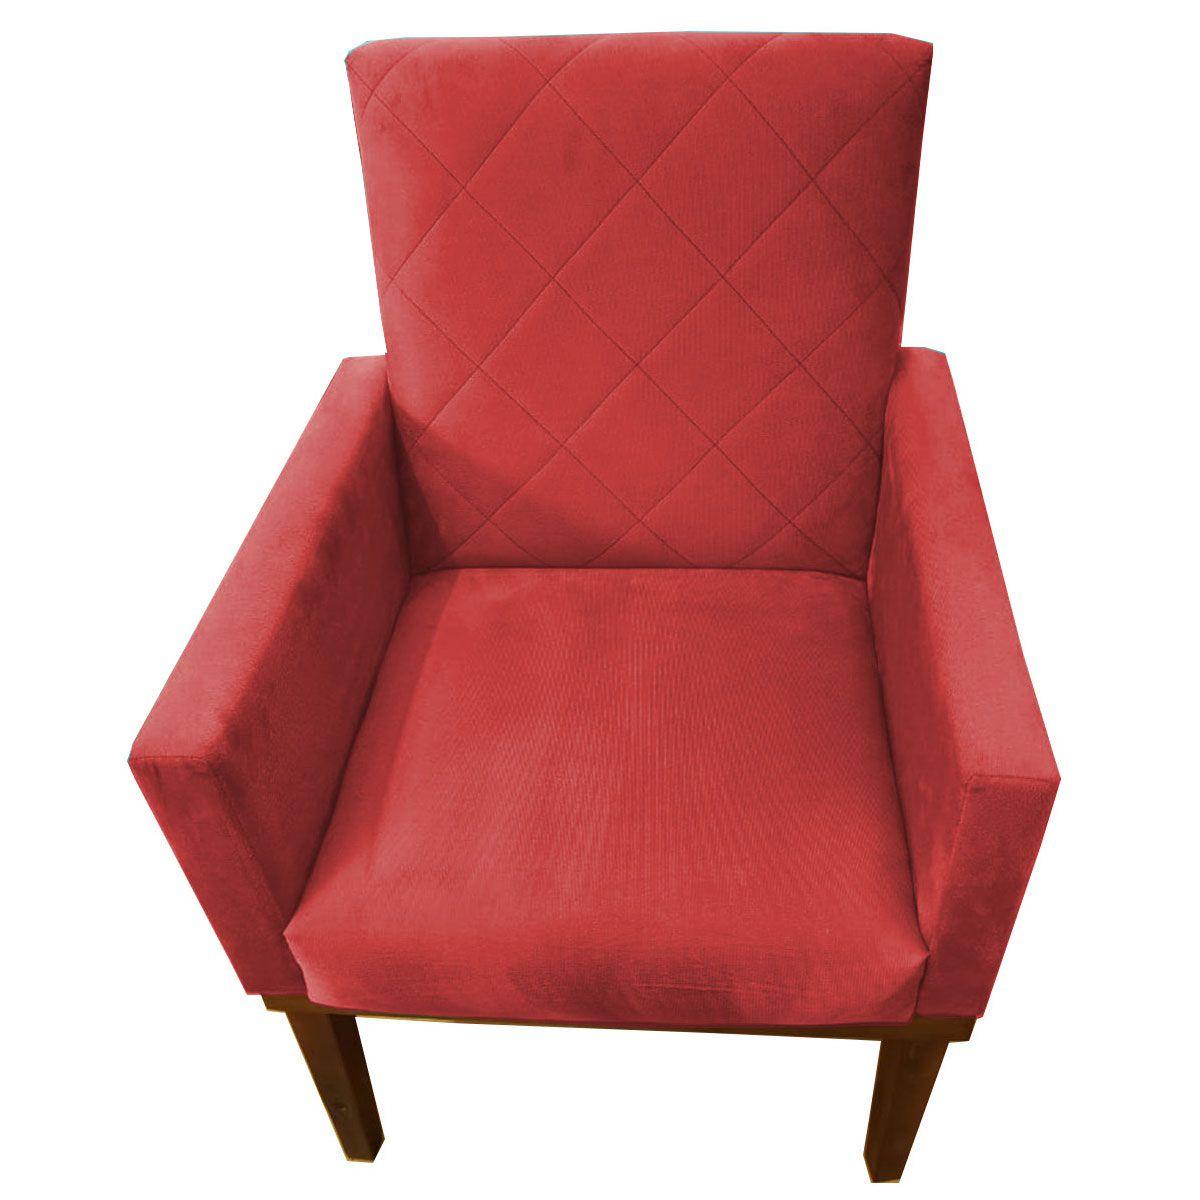 Poltrona Decorativa Beatriz Base Madeira Tecido Vermelho